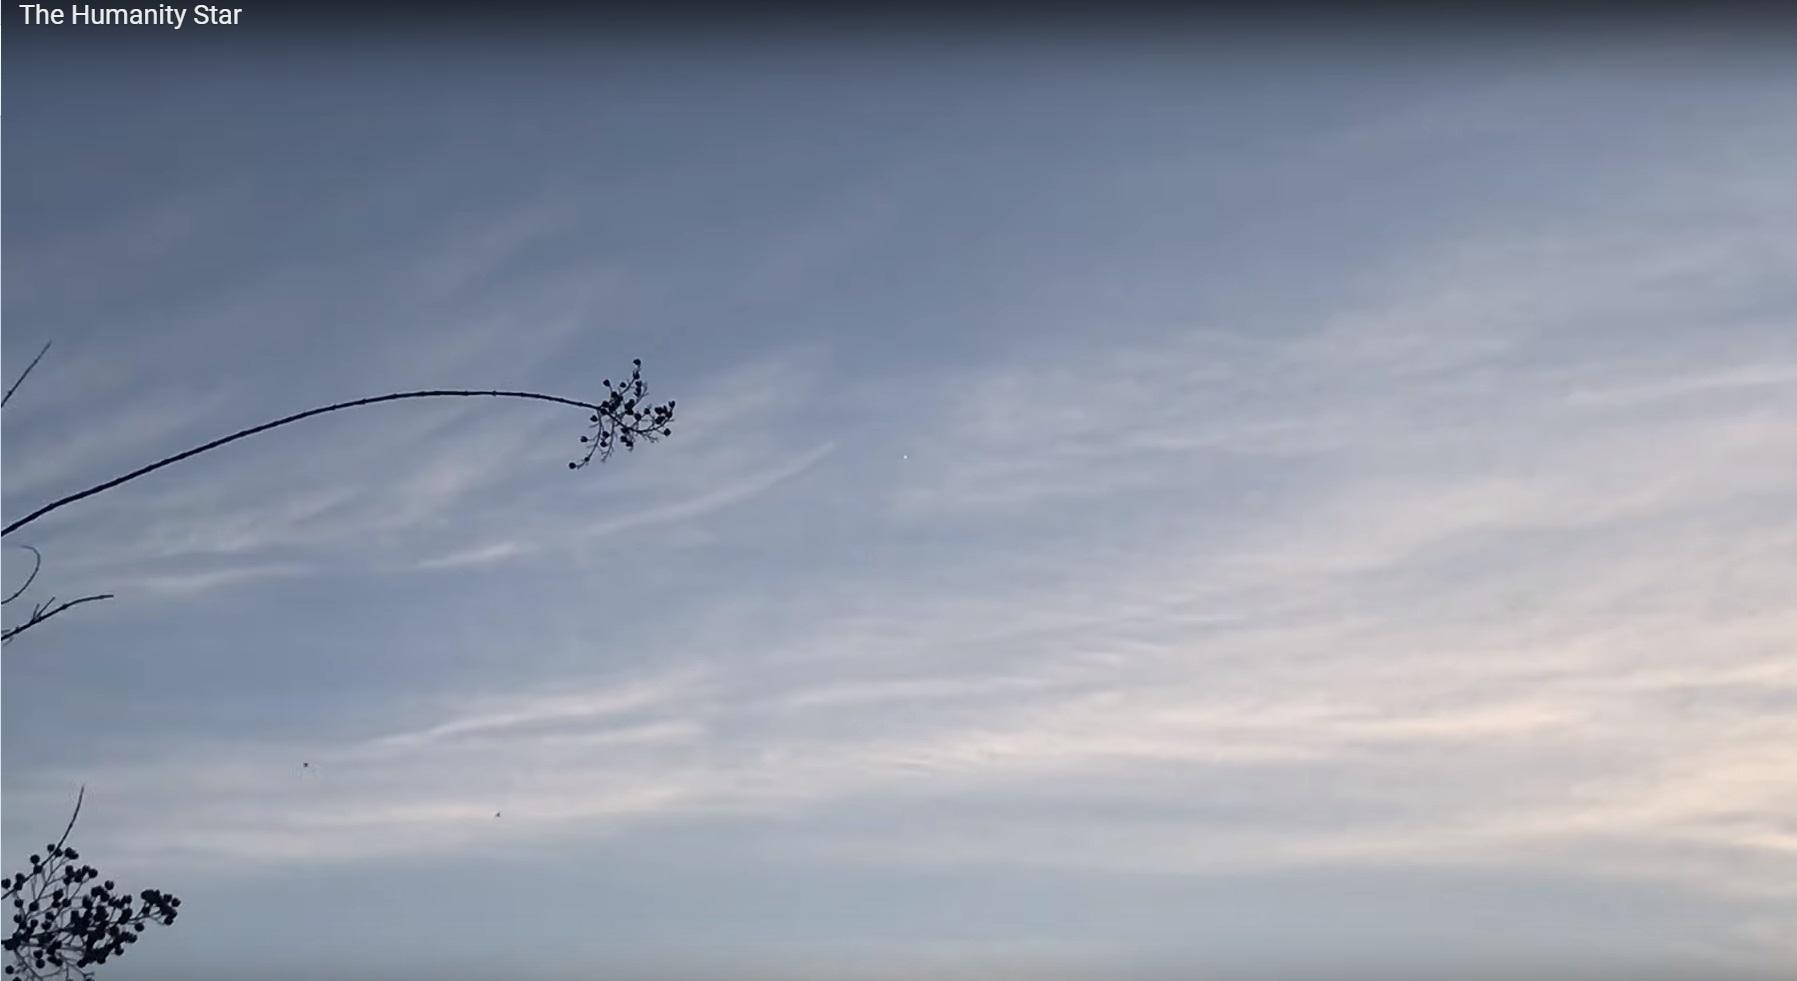 Облачно, вероятна неотключаемая реклама на звездном небе - 7